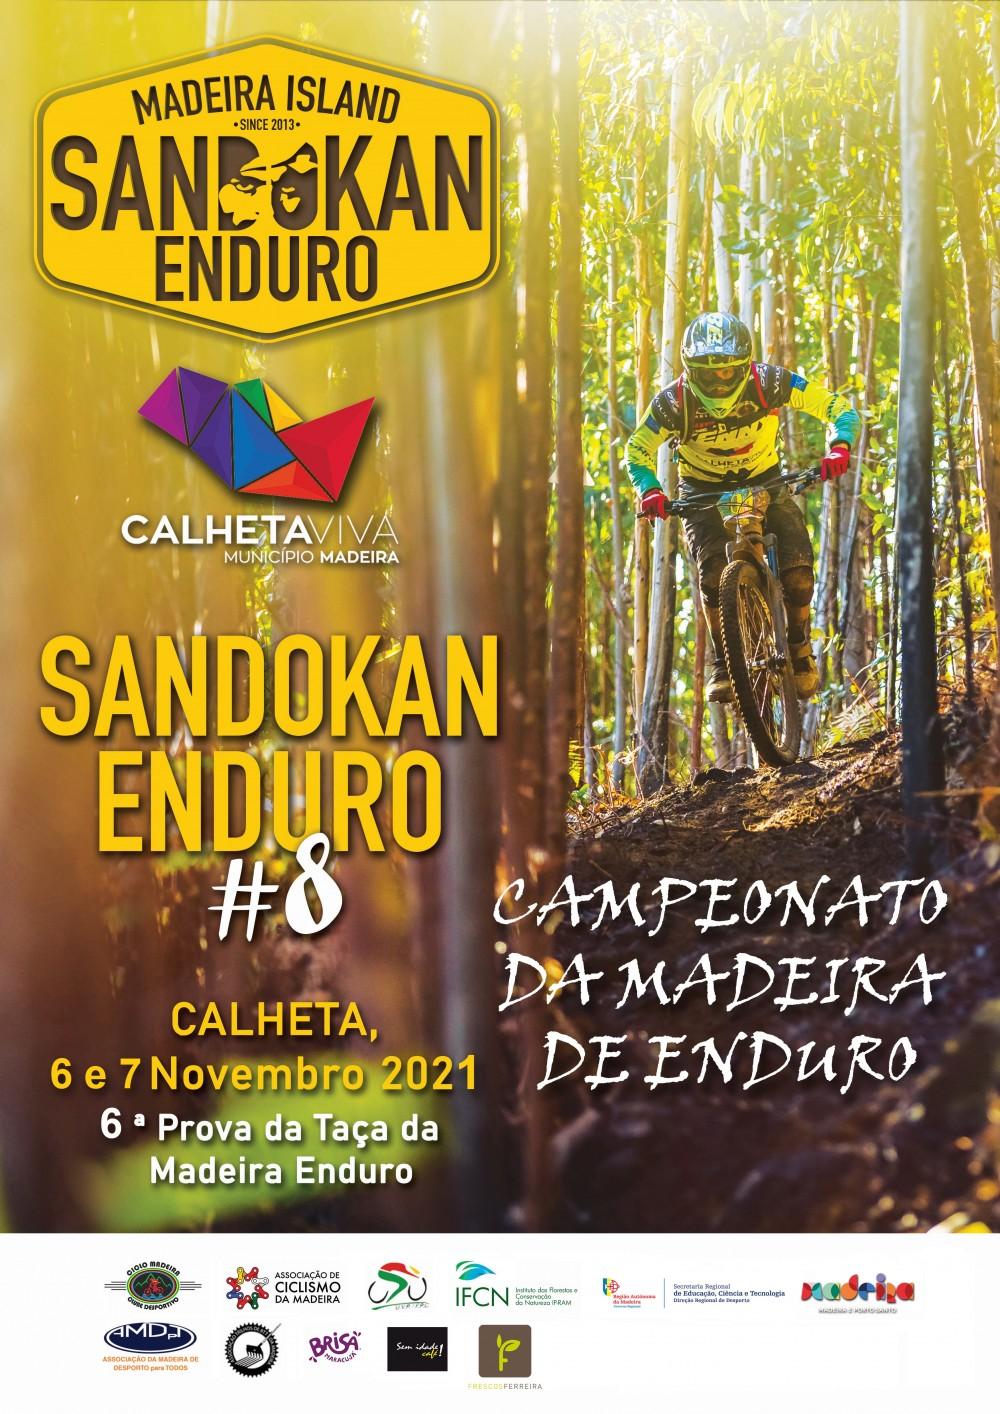 Campeonato da Madeira de Enduro - Sandokan 2021